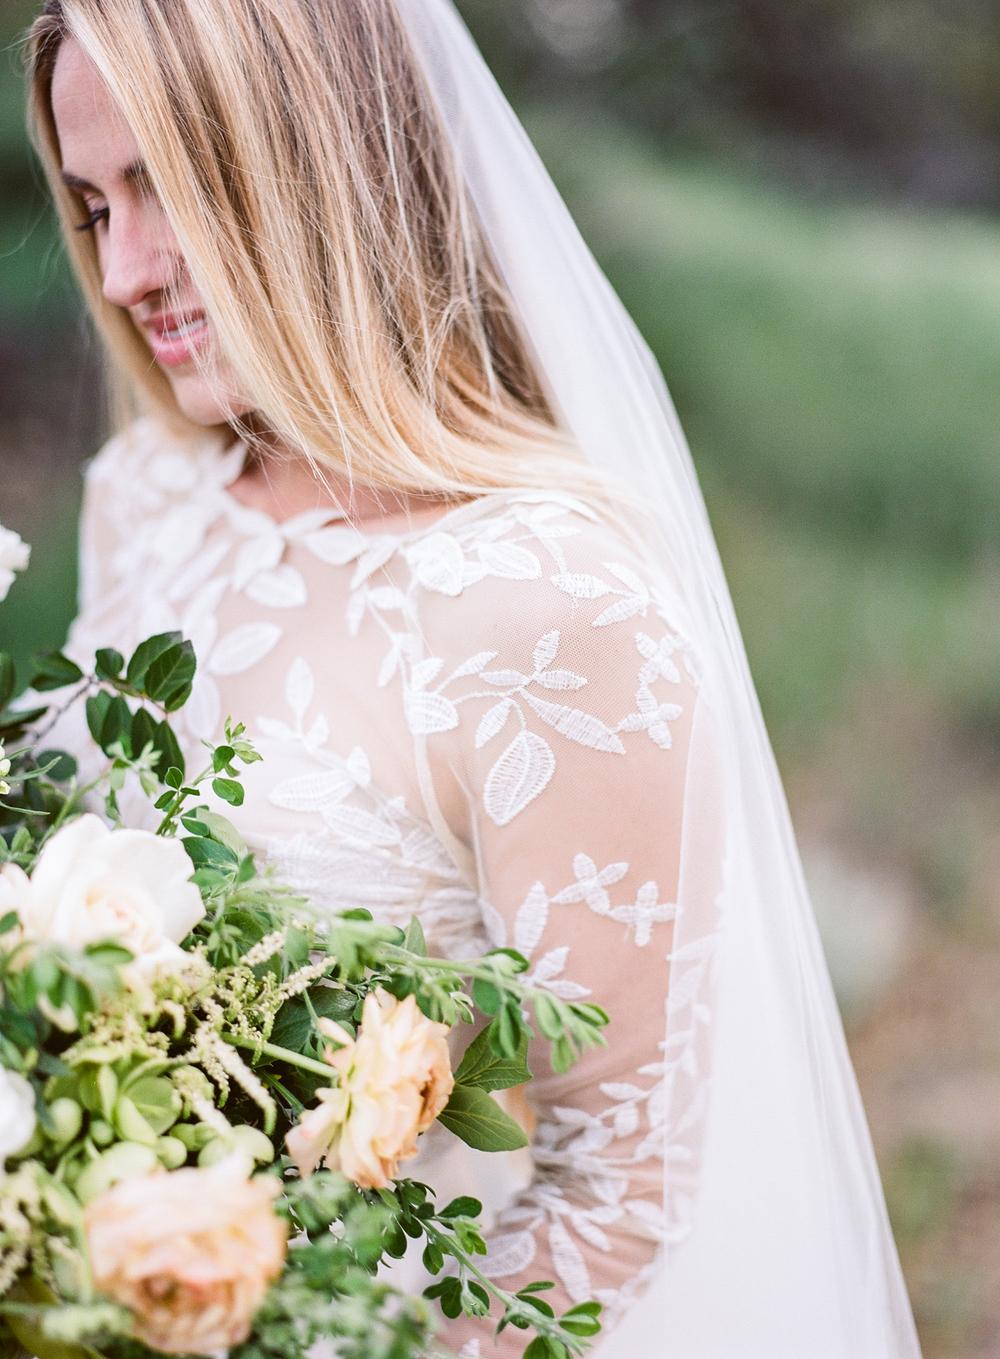 013-Jen-Wojcik-Photography-San-Diego-Photographer.jpg